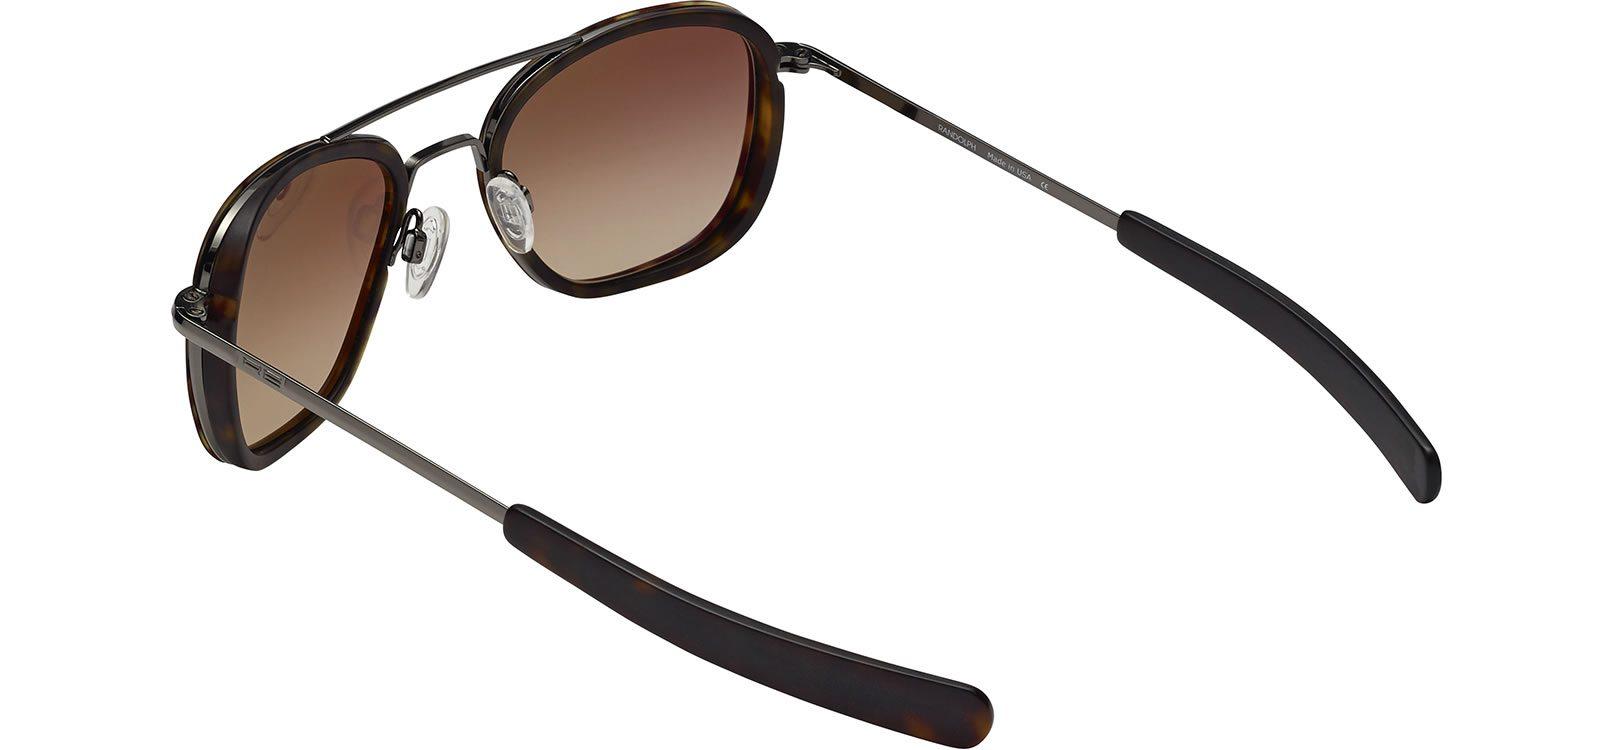 ea6faa5b231 ... Randolph Aviator AI007 Gunmetal Tan Gradient 58mm Sonnenbrillen von Randolph  Engineering   3 +